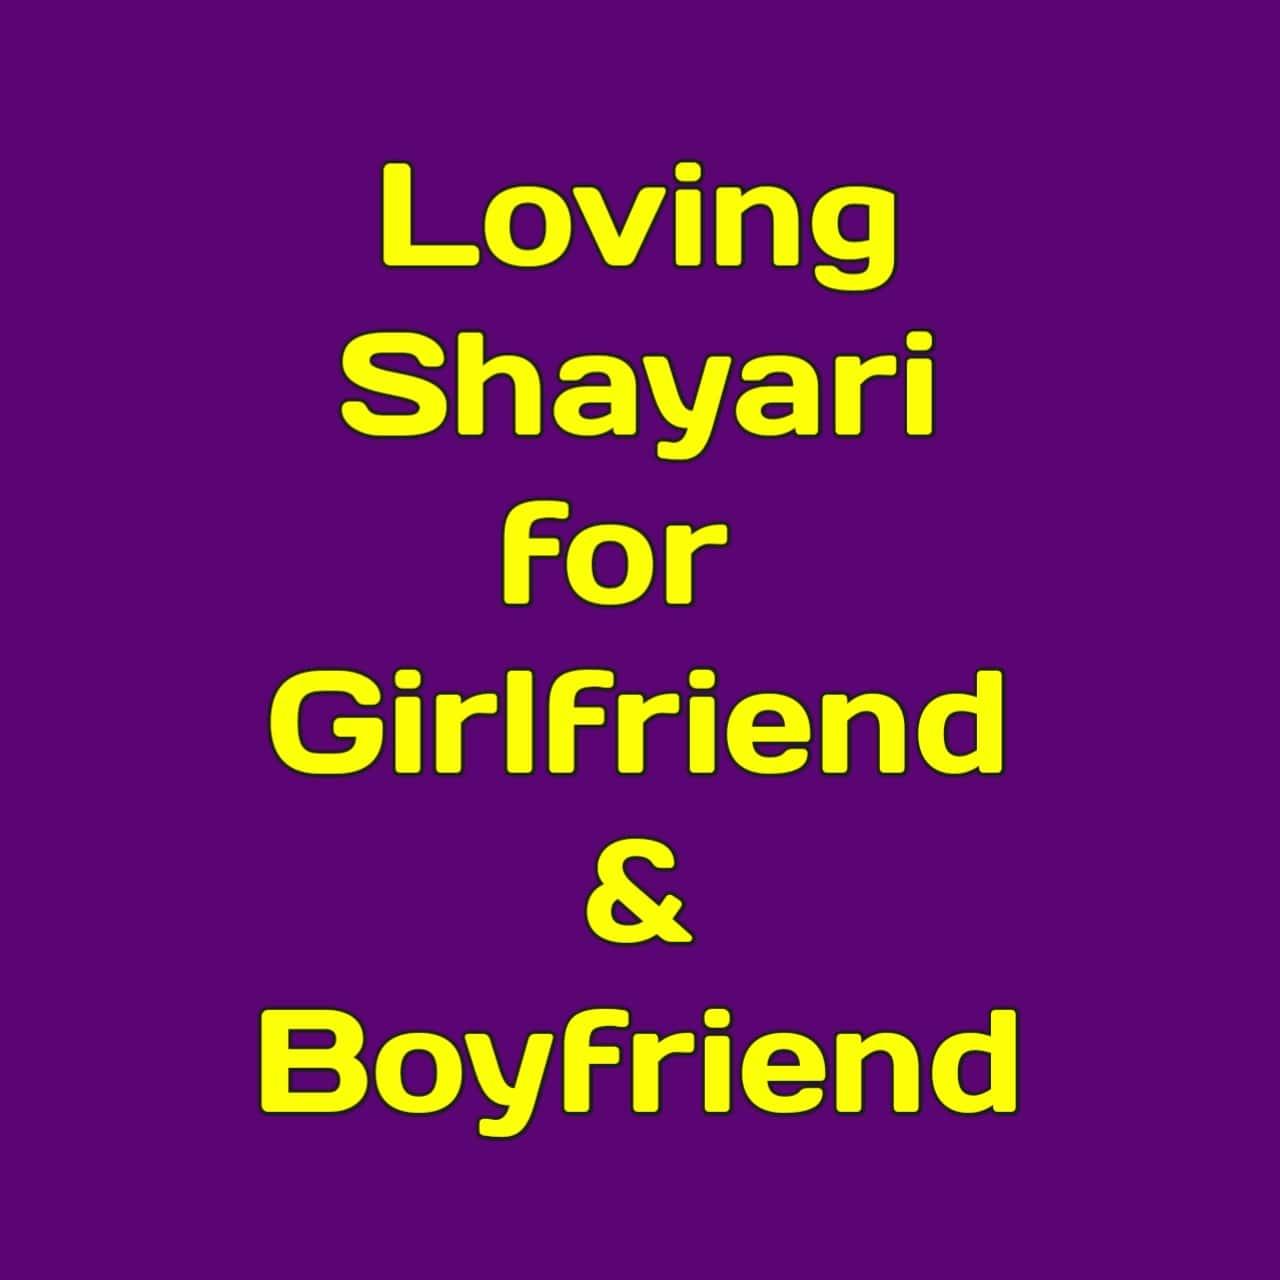 Loving shayari for girlfriend & boyfriend